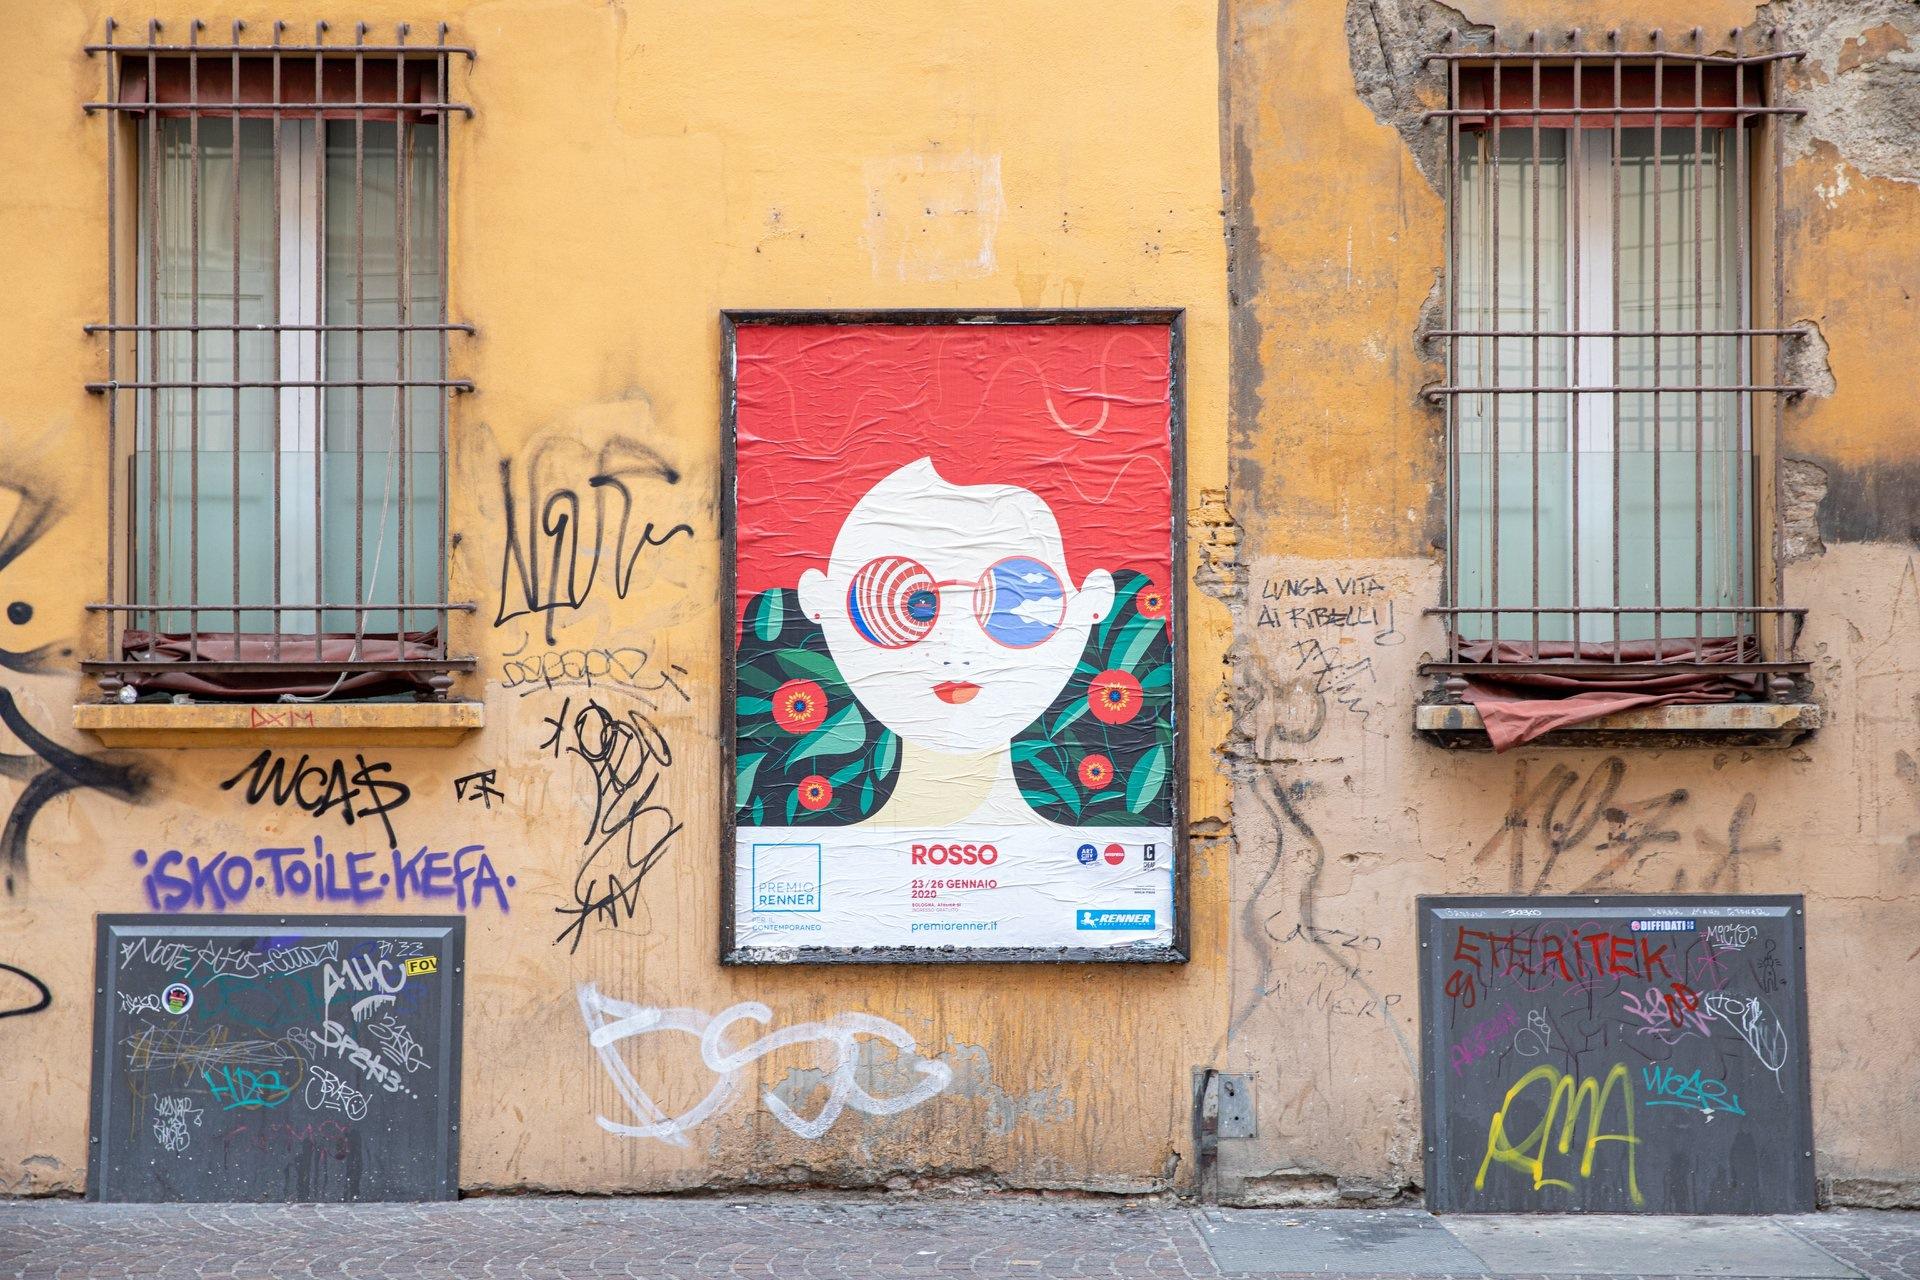 CHEAP per Premio Renner Giulia Piras. Foto: Margherita Caprili